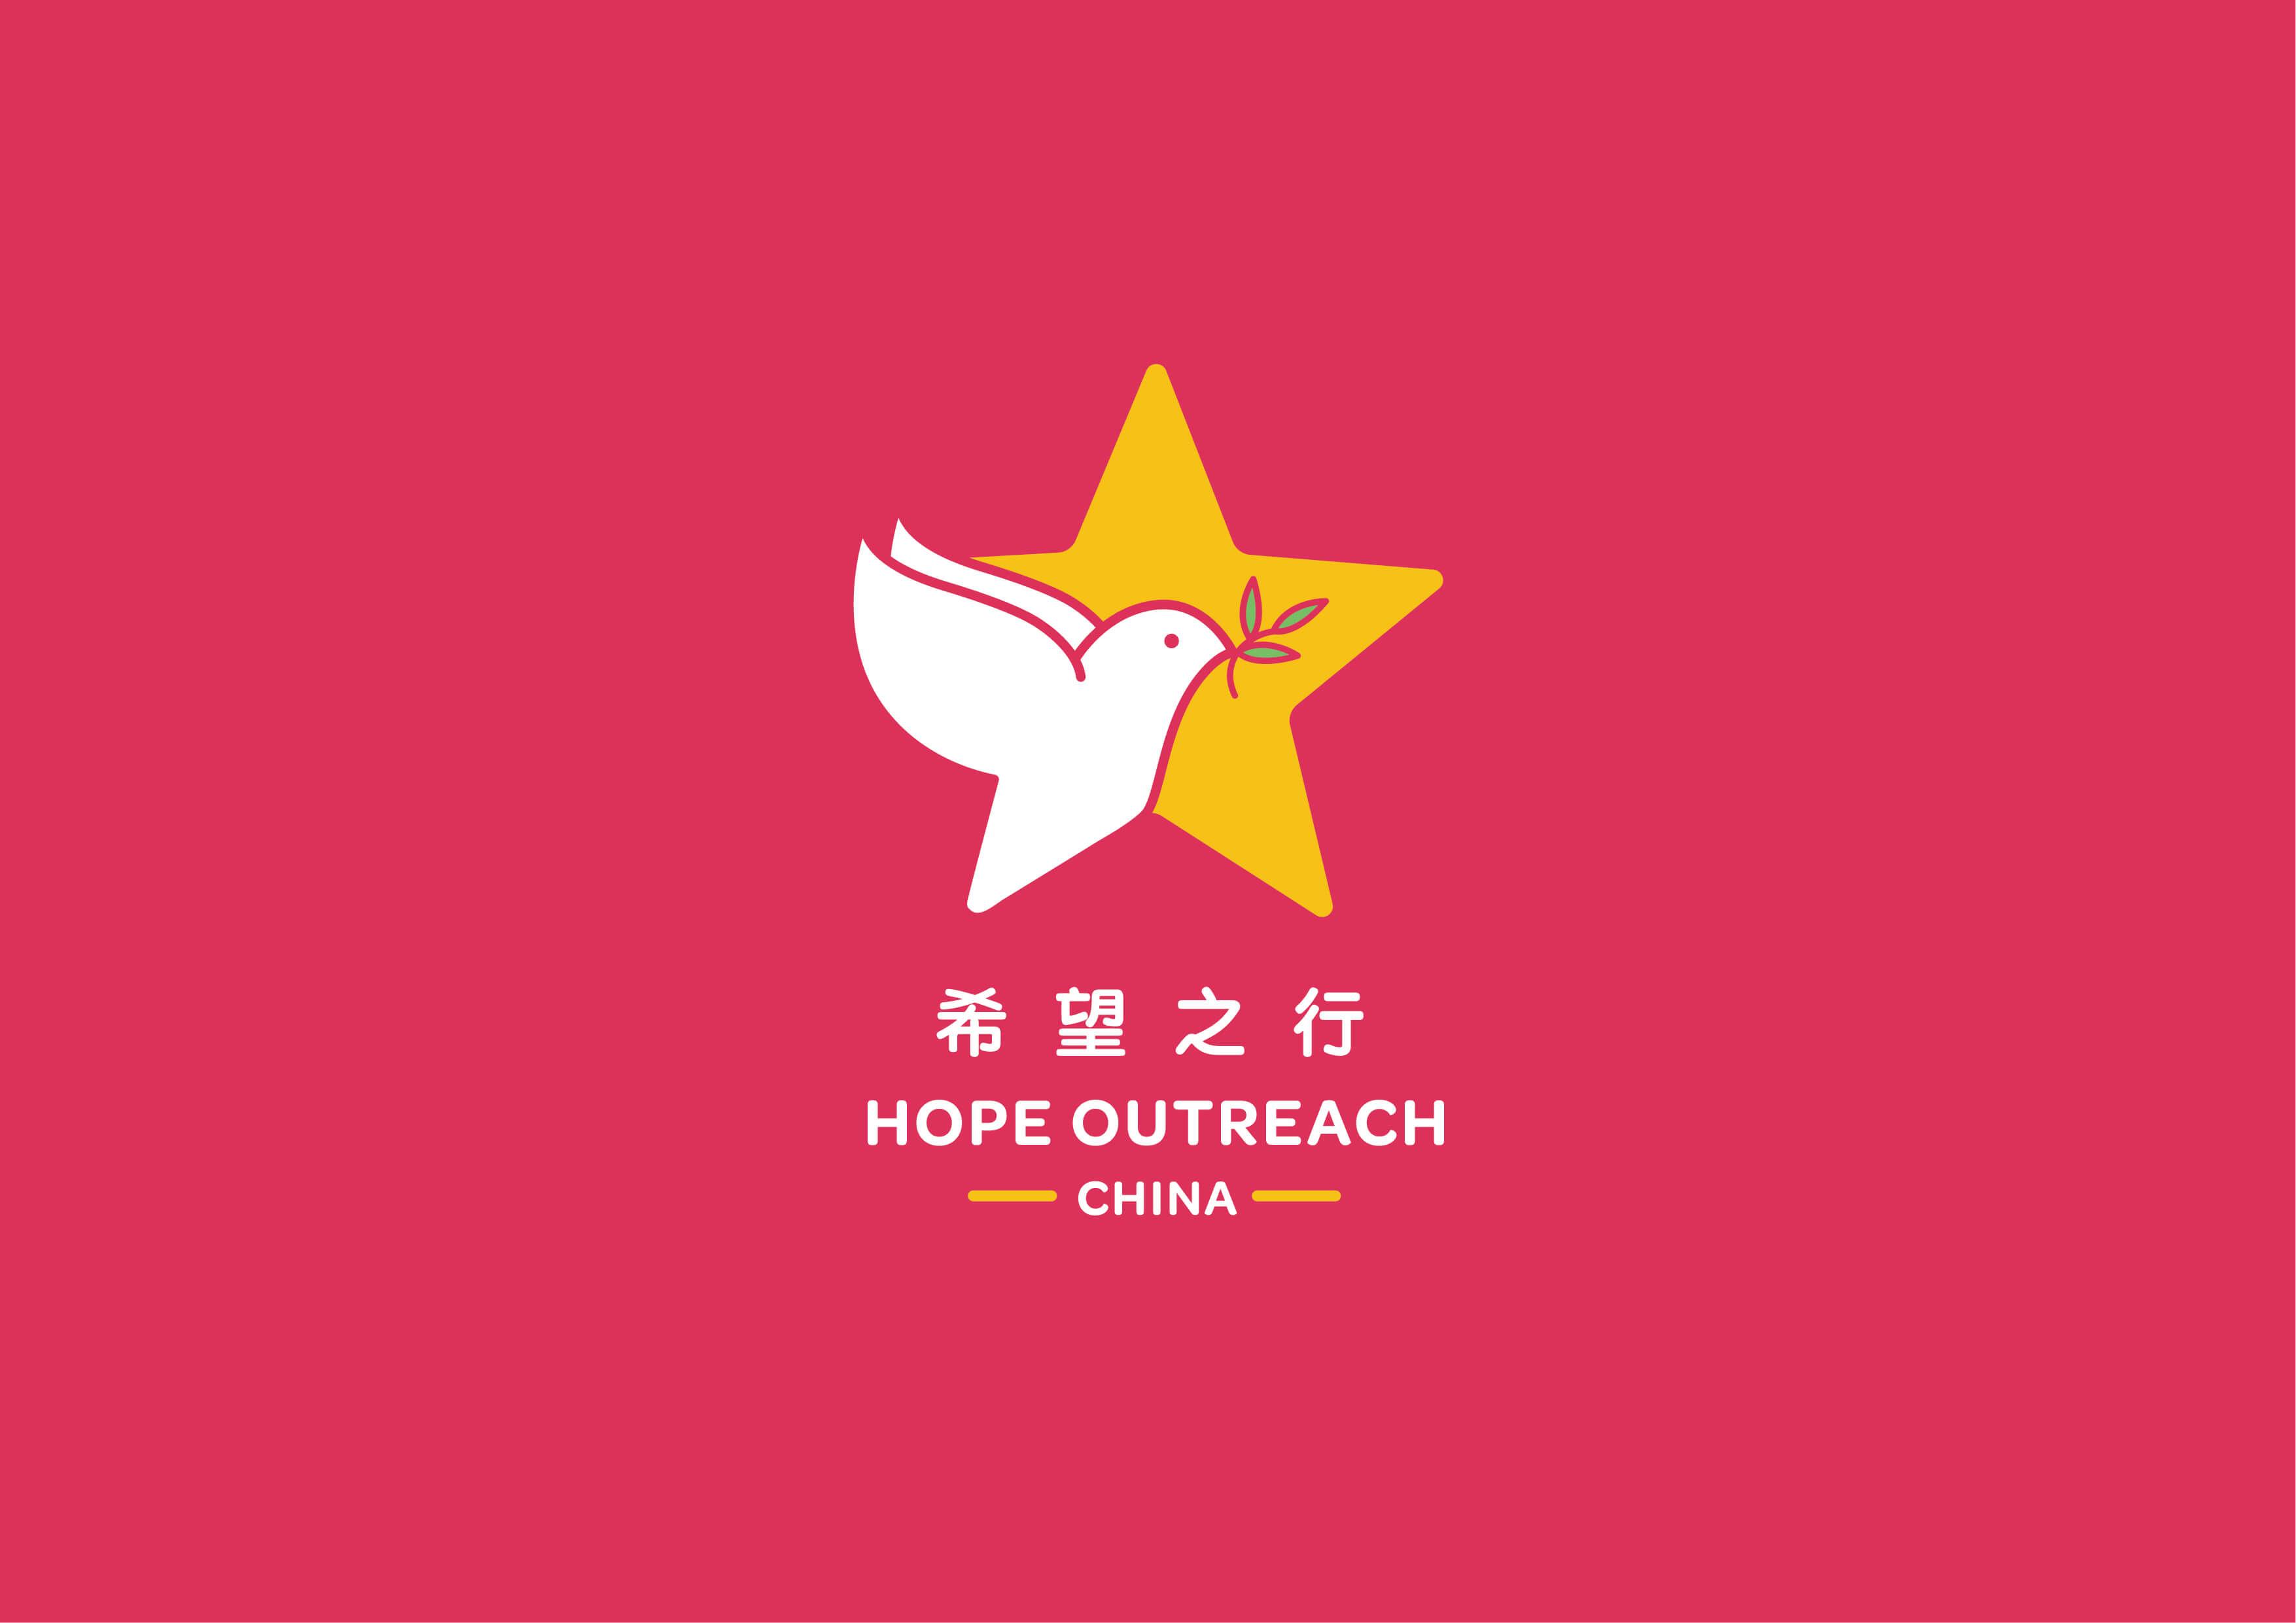 Hope Outreach